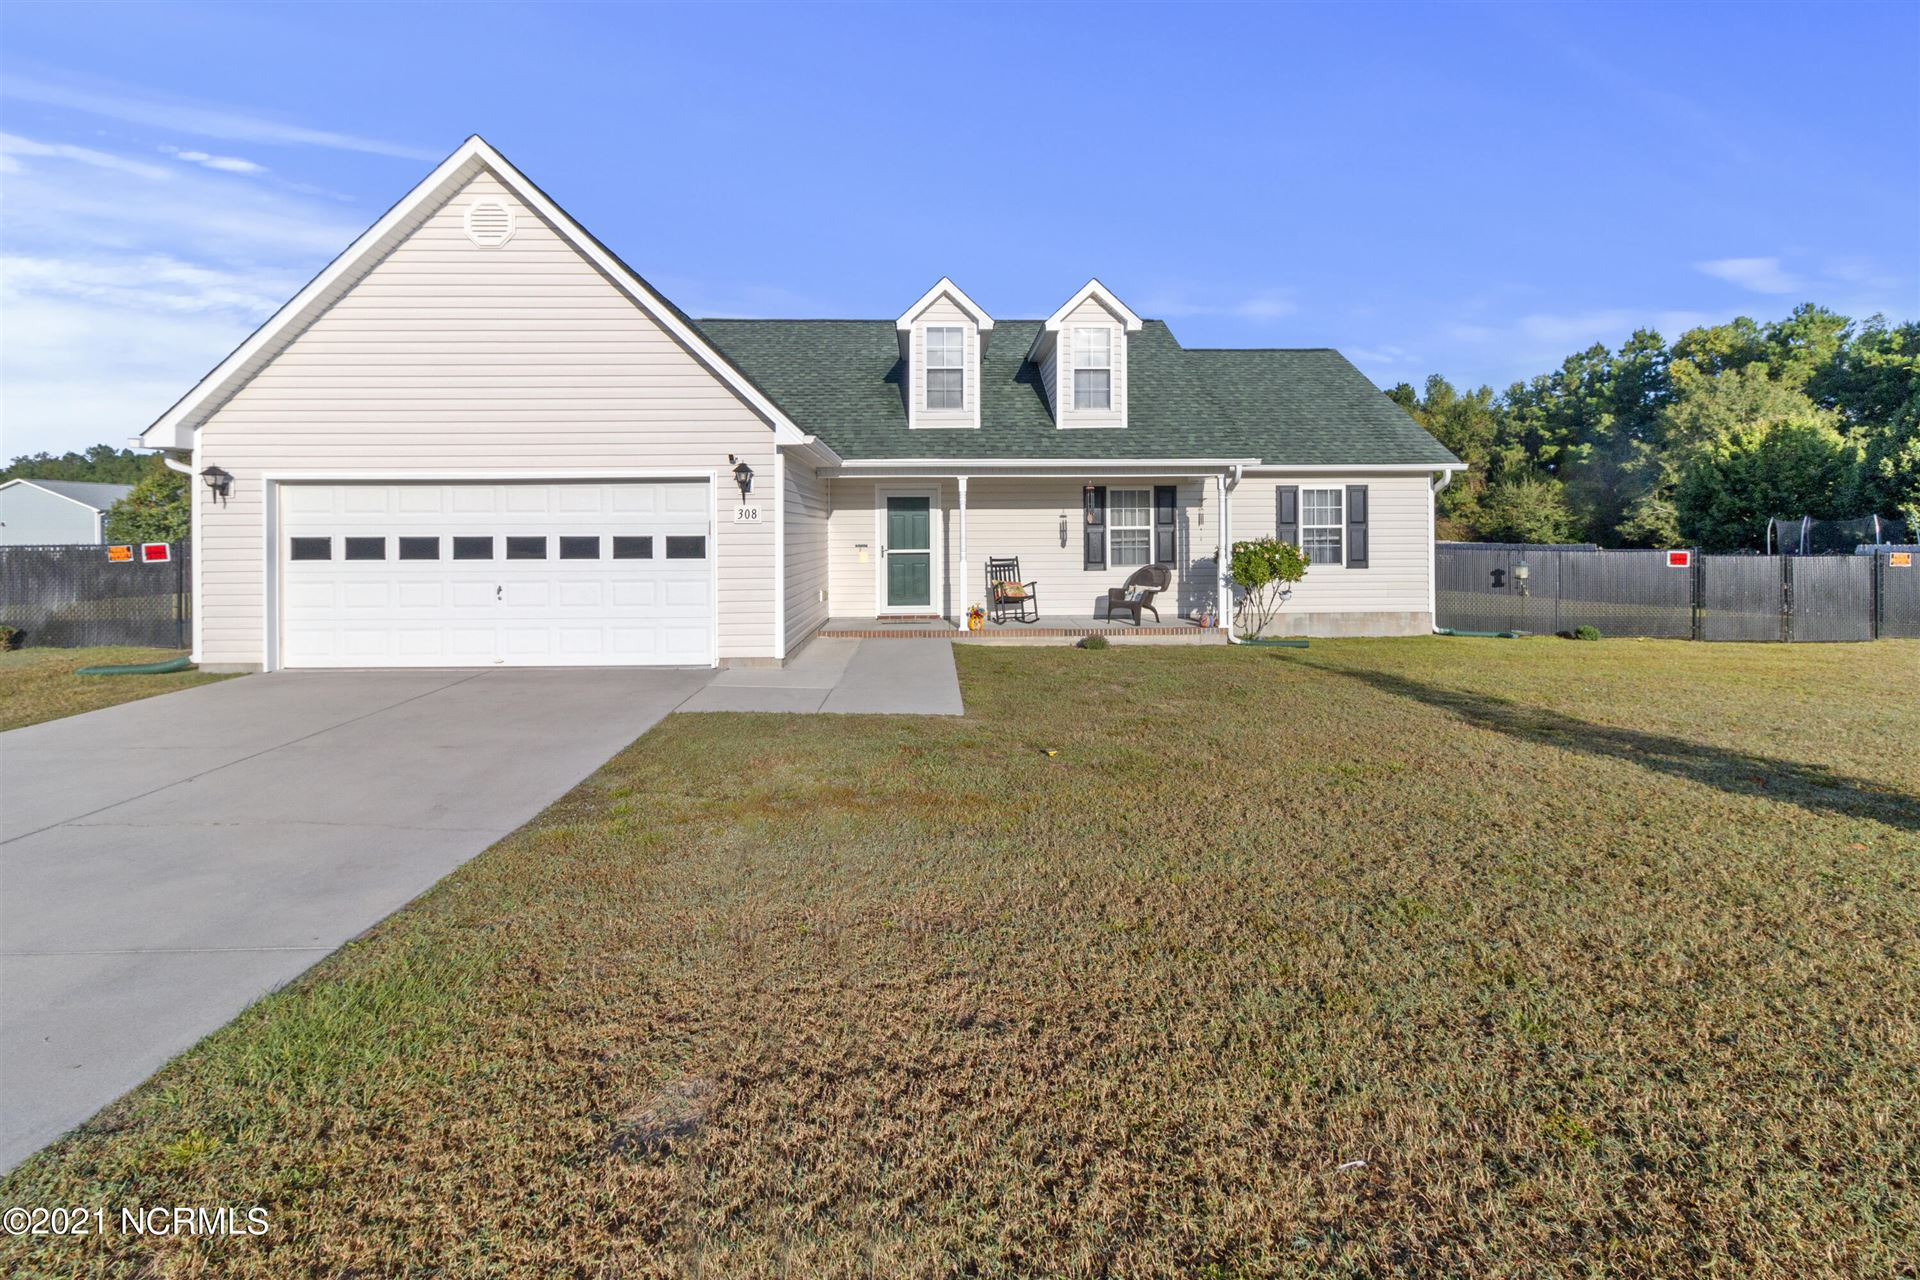 Photo of 308 Parkton Drive, Richlands, NC 28574 (MLS # 100294388)